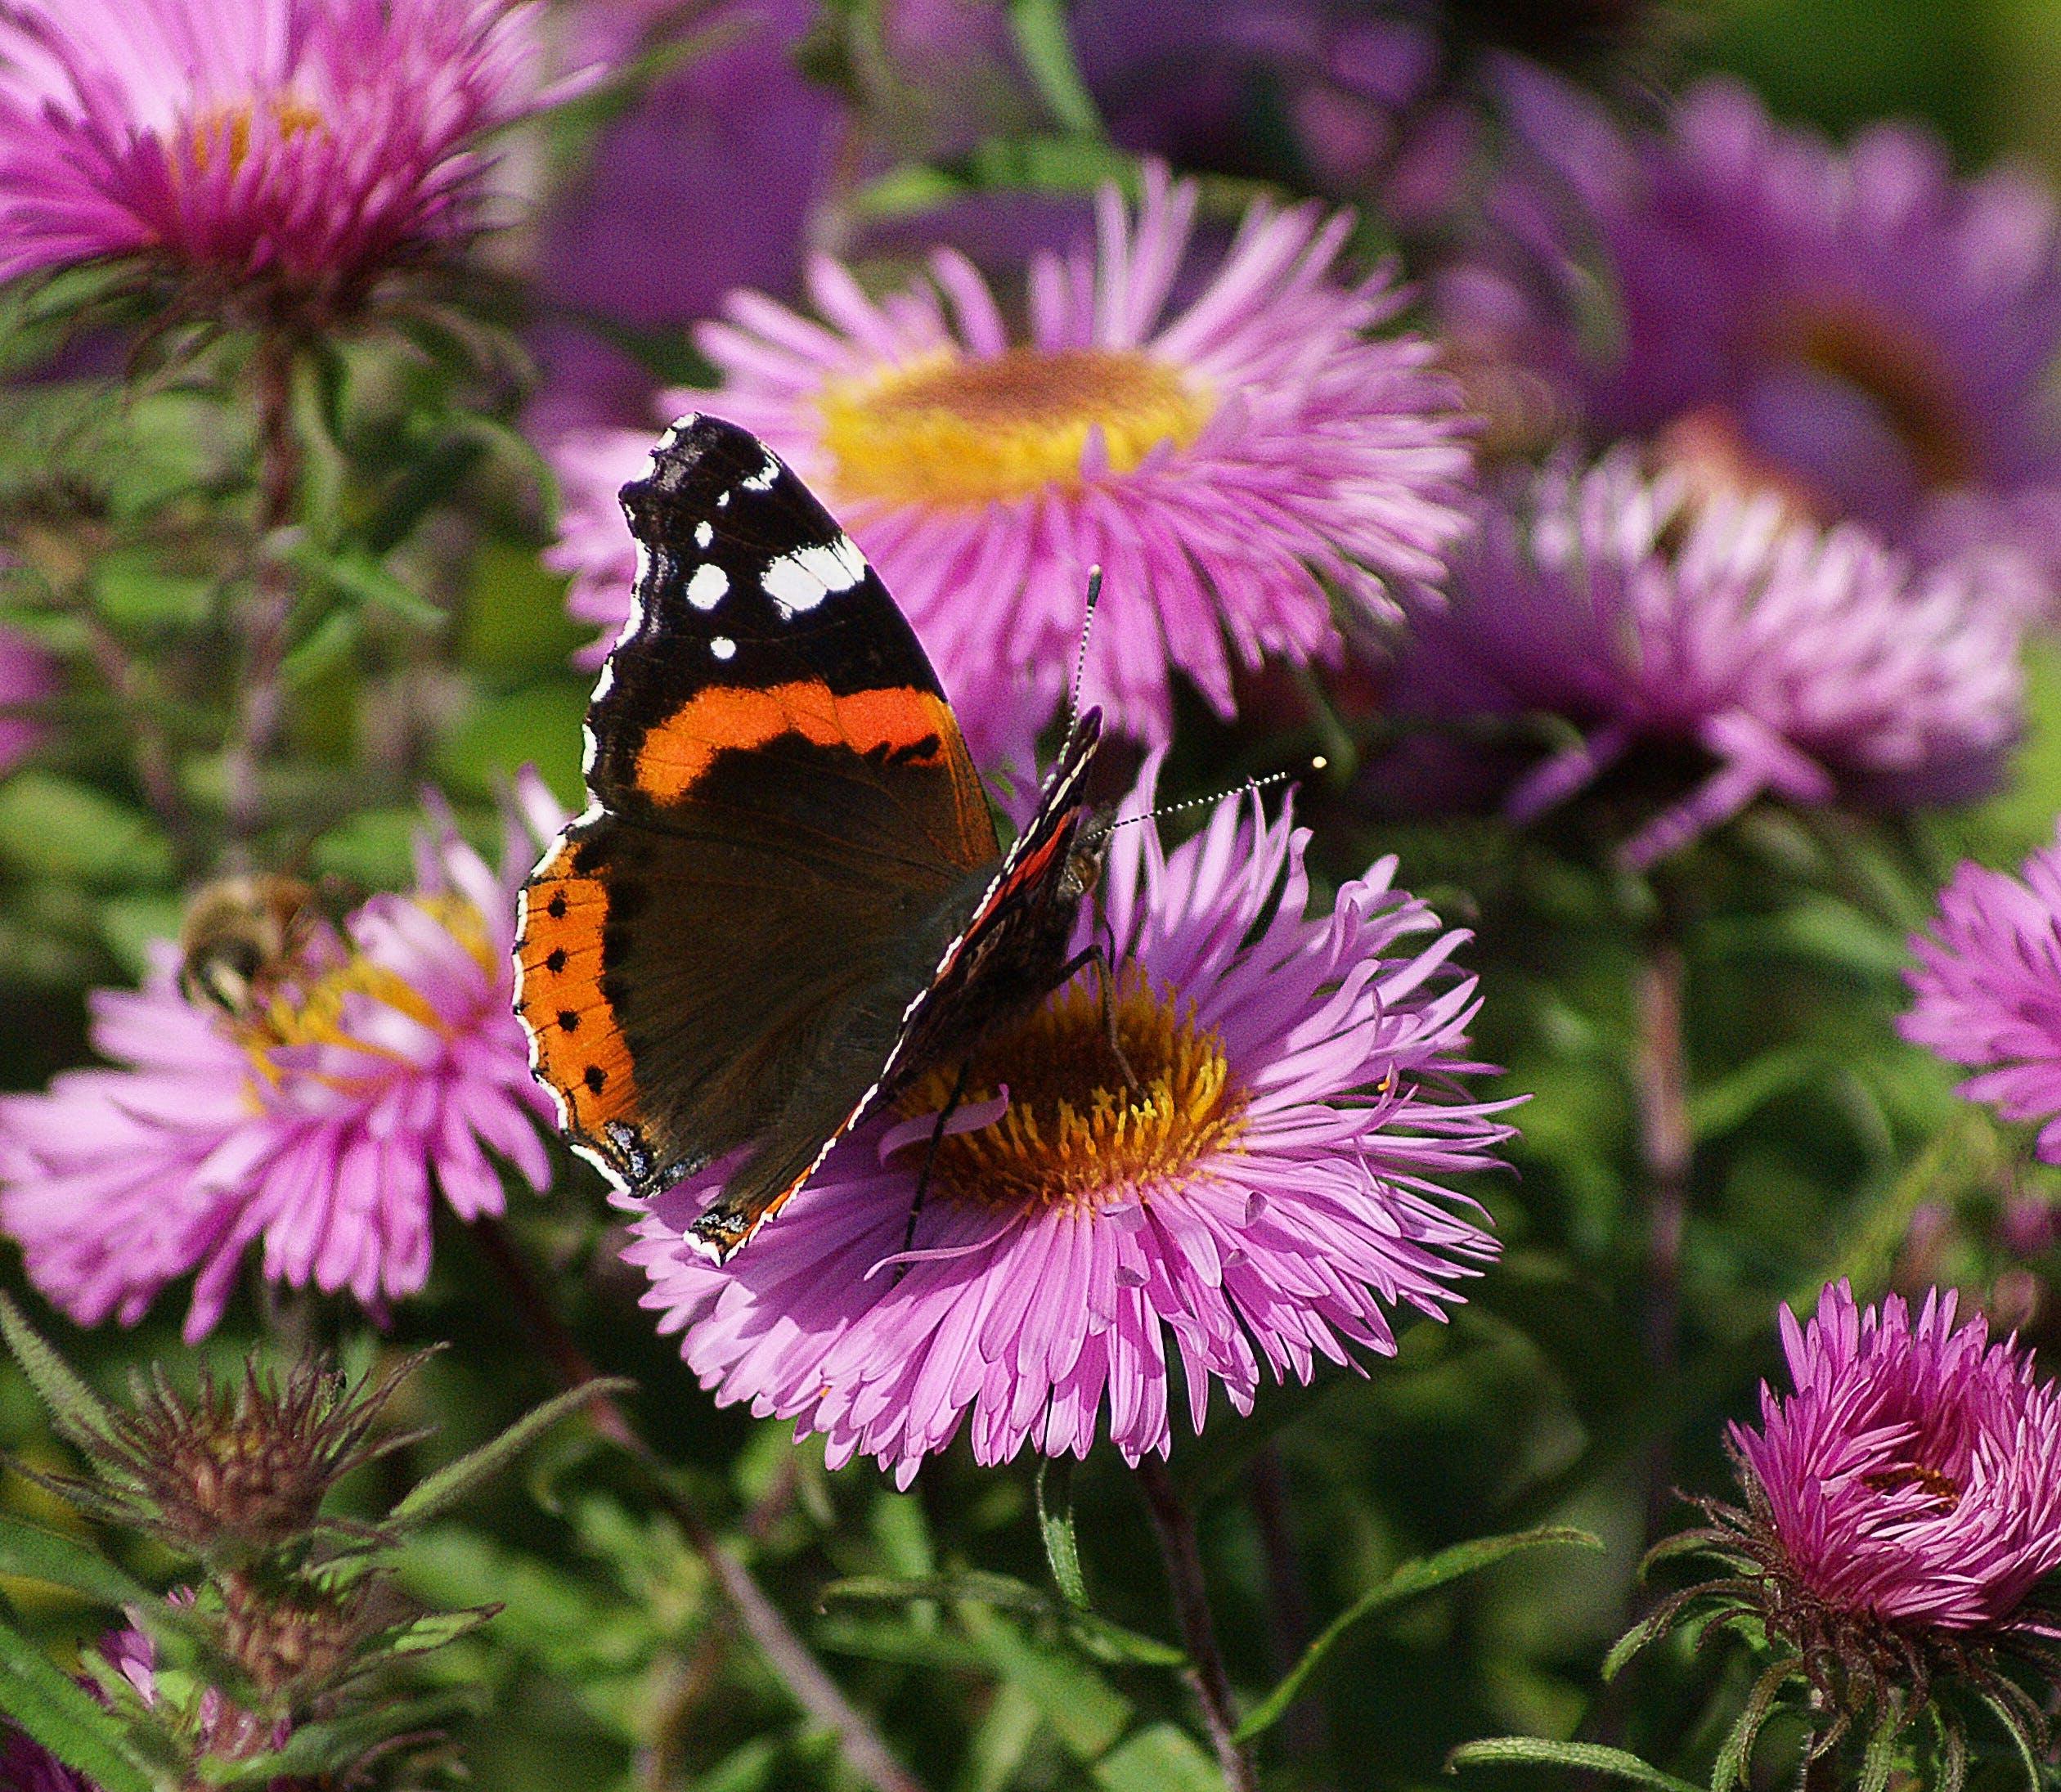 Black Orange White Butterfly on Purple Multi Petal Flower during Daytime